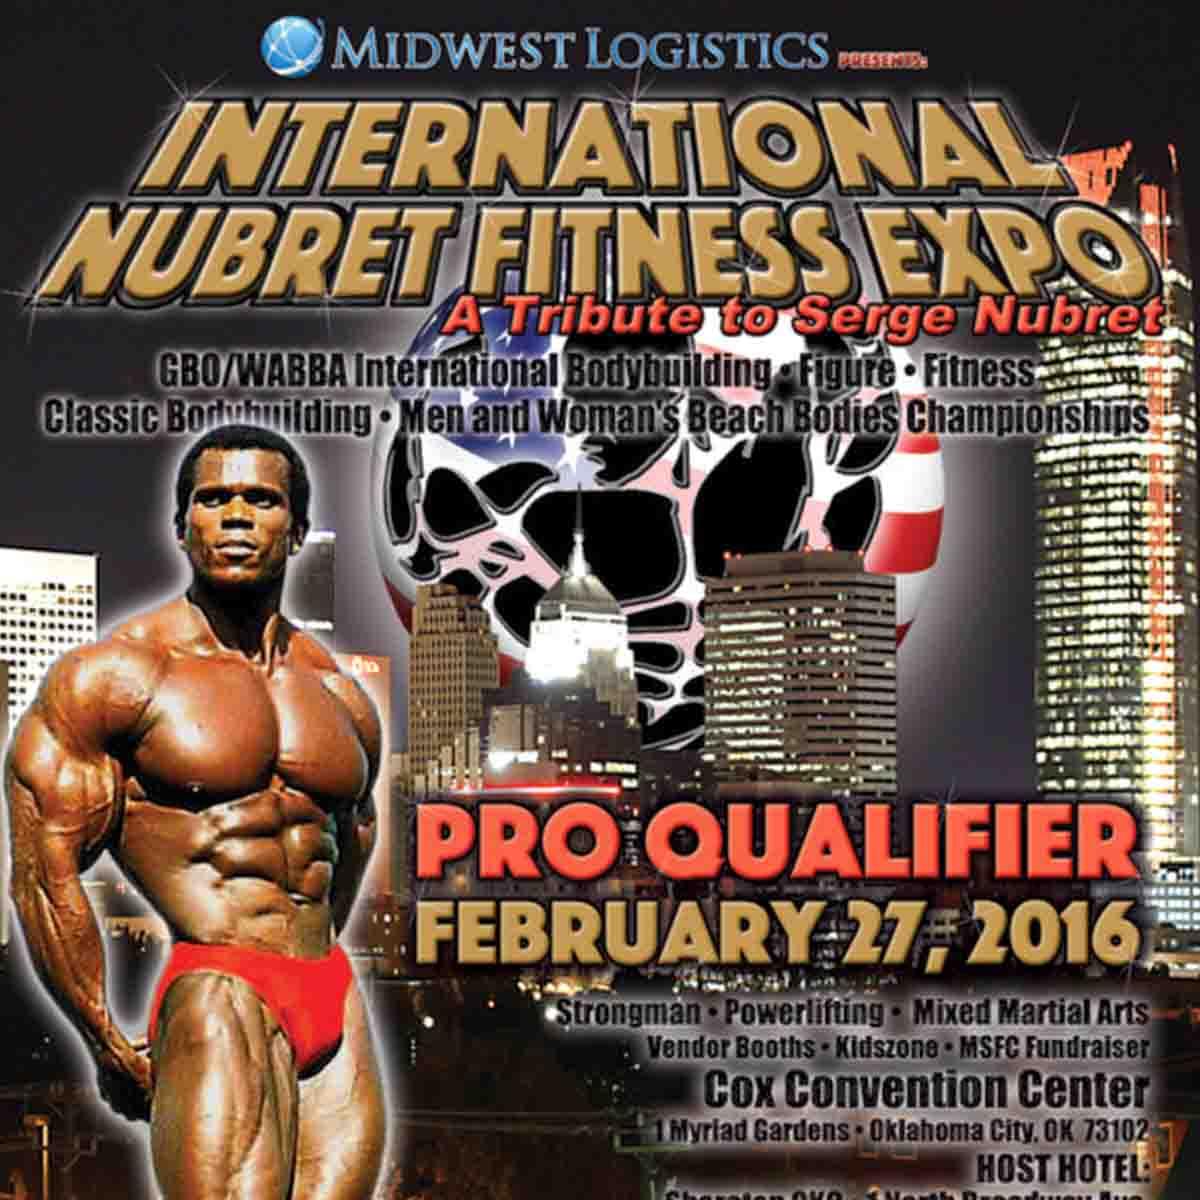 International Nubret Fitness Expo 1:1